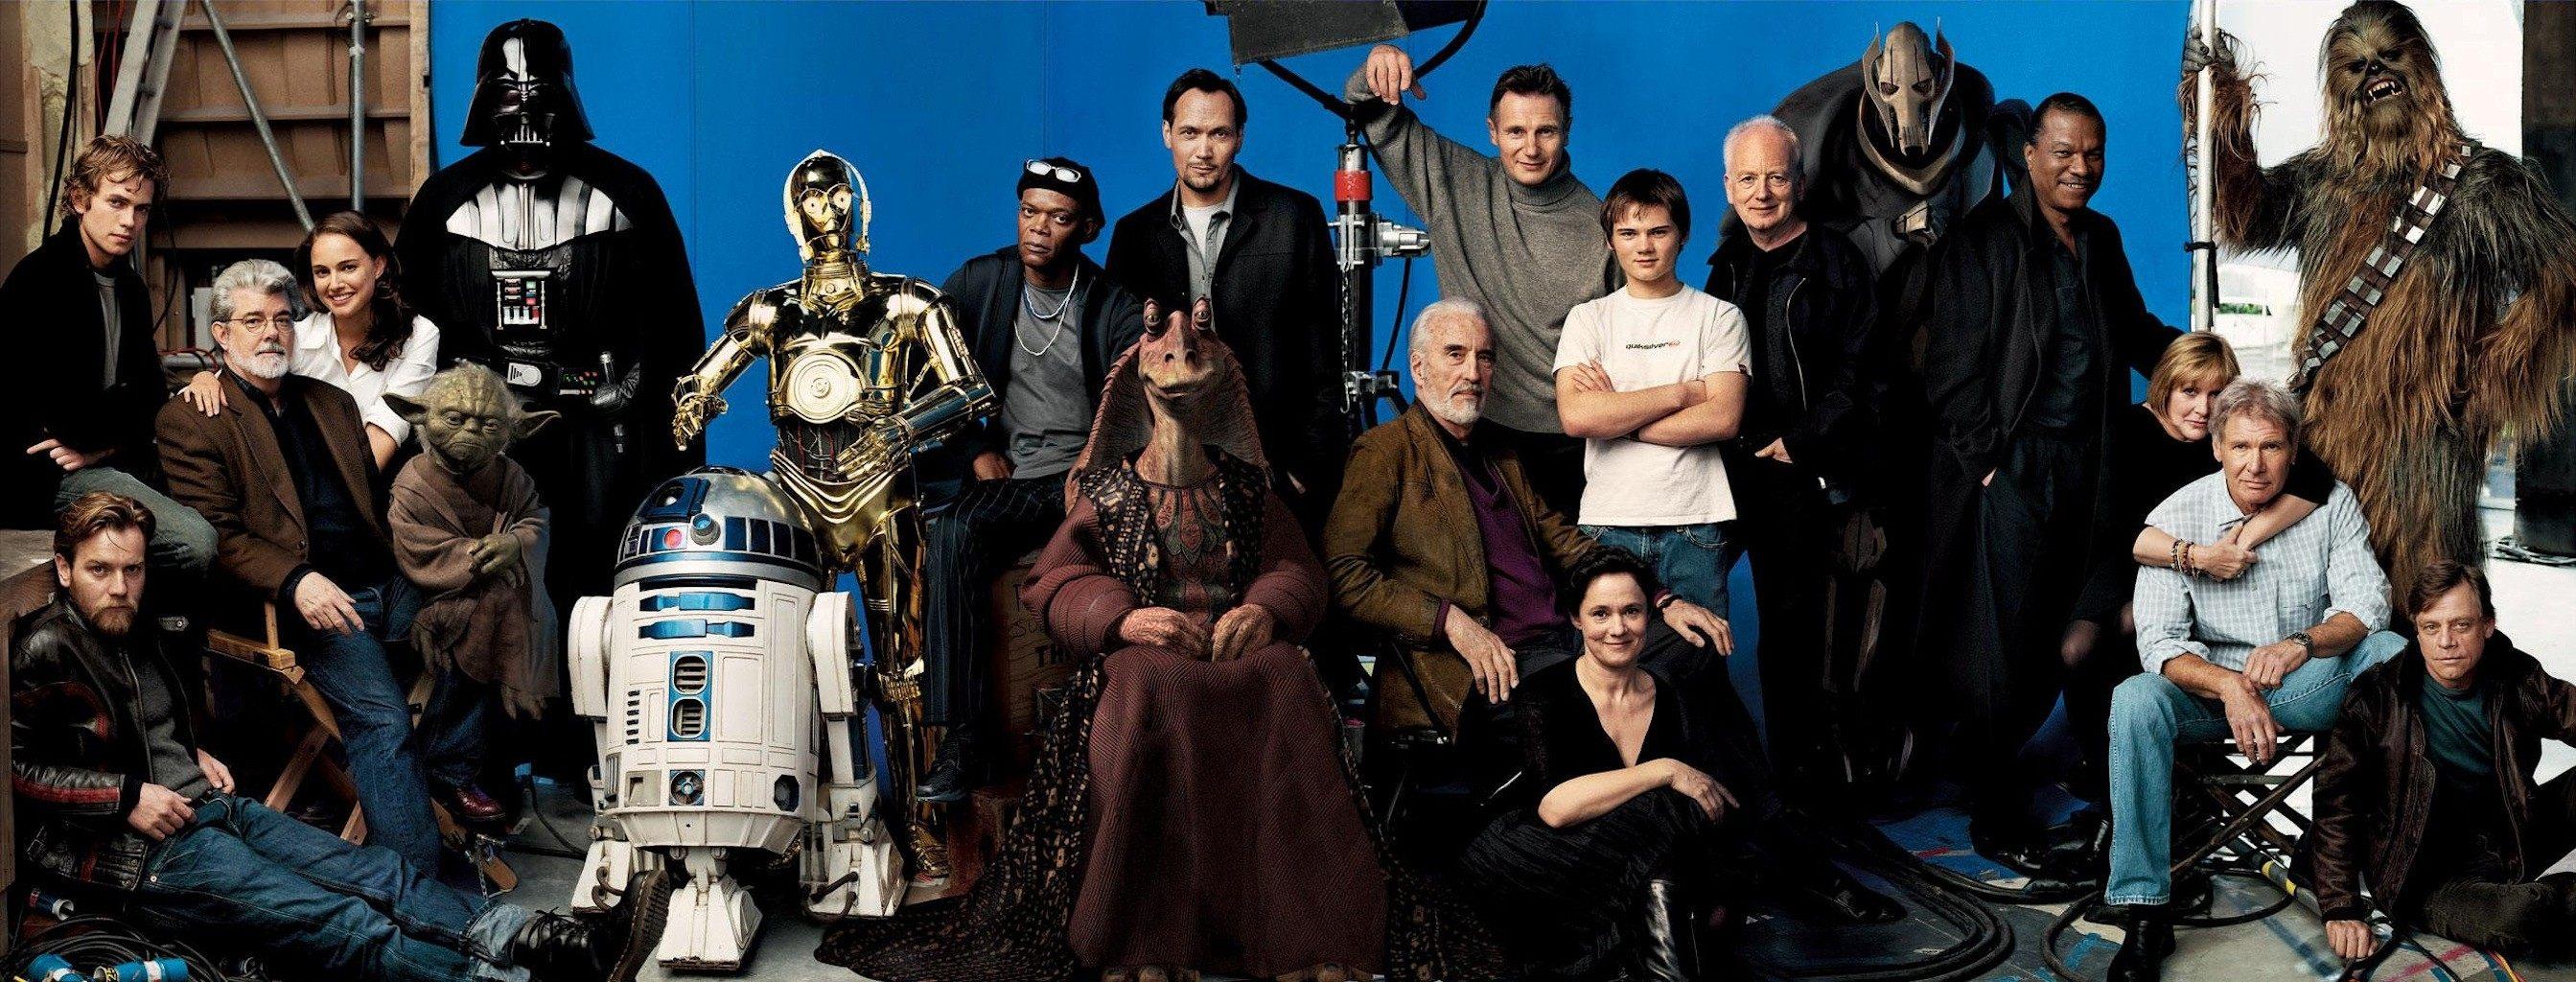 звездные войны все актеры